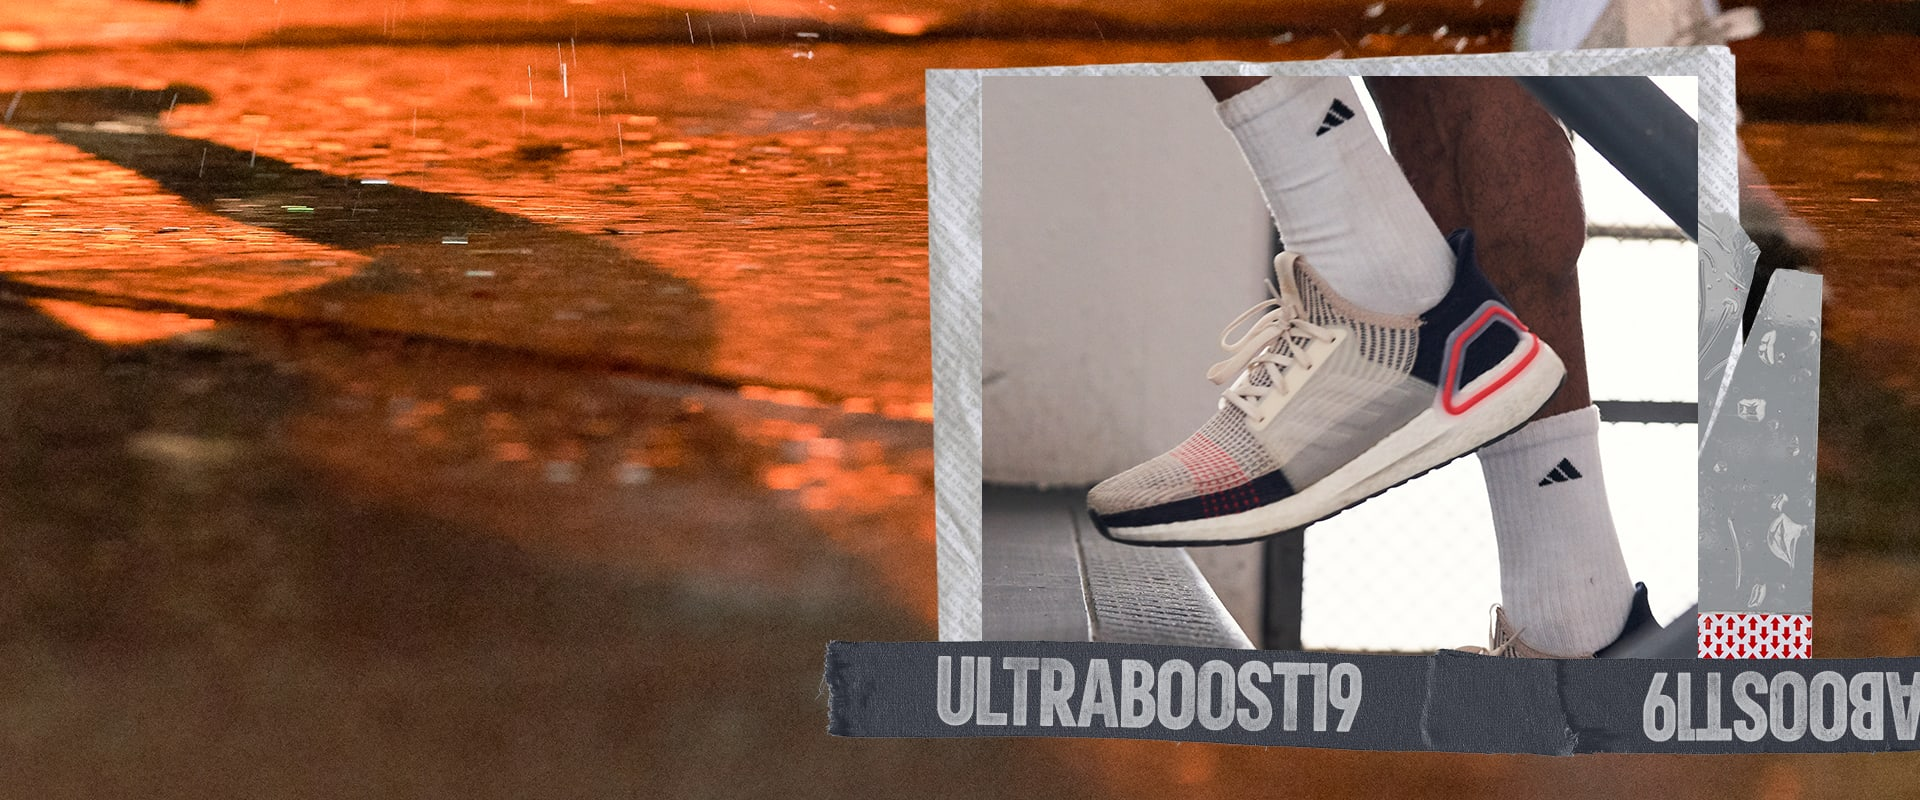 the latest 6cc7f 6c941 REBOOSTÉE. Voici la chaussure adidas ...